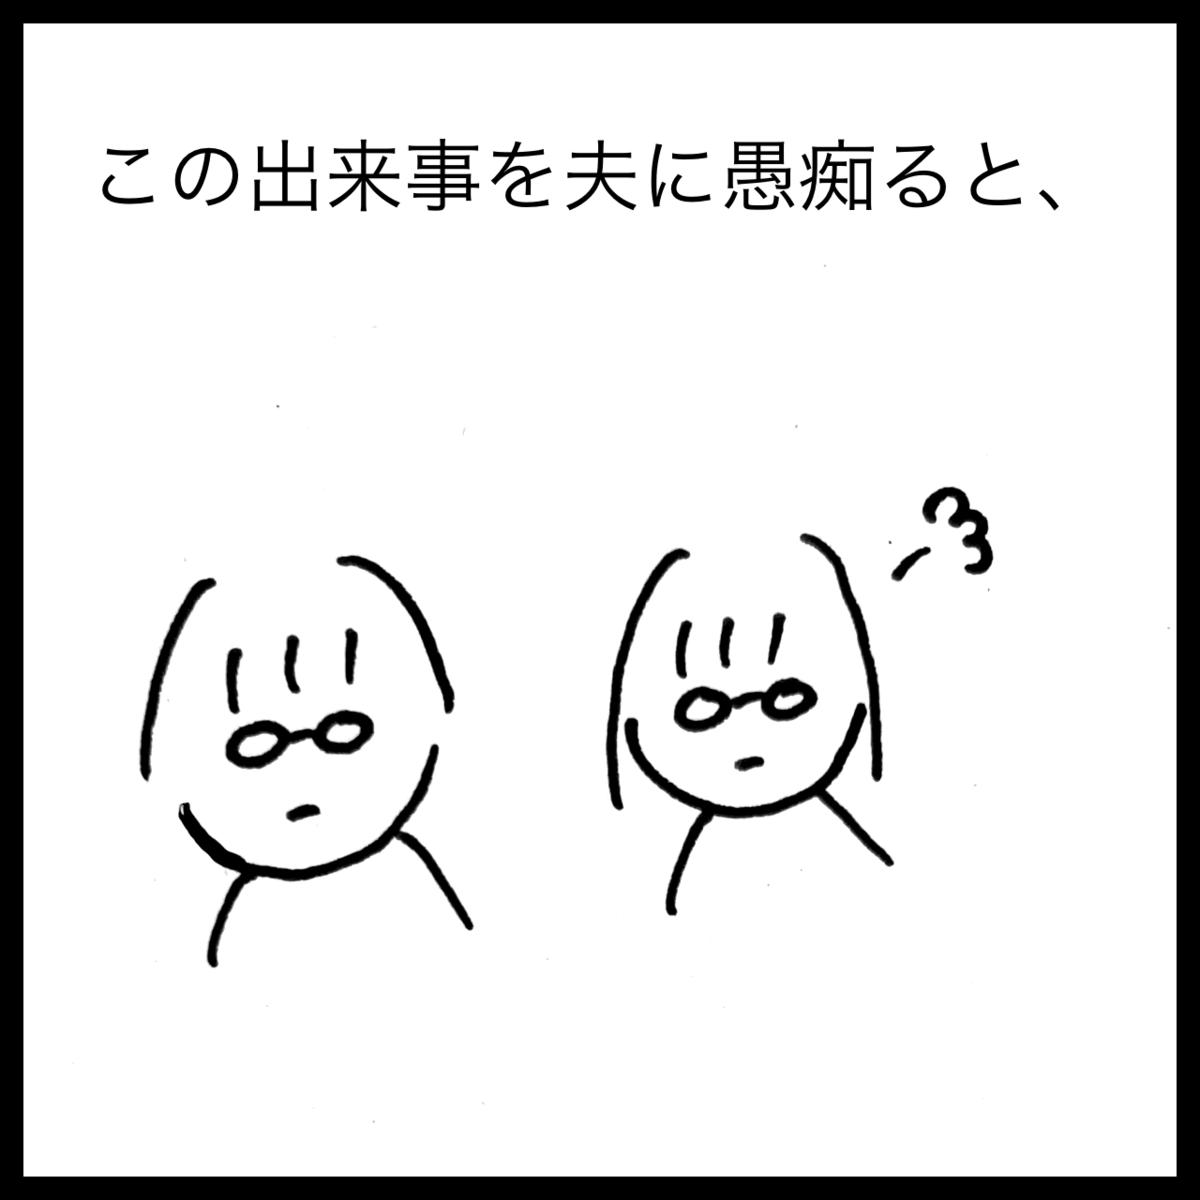 f:id:komyusyomama:20210728214708p:plain